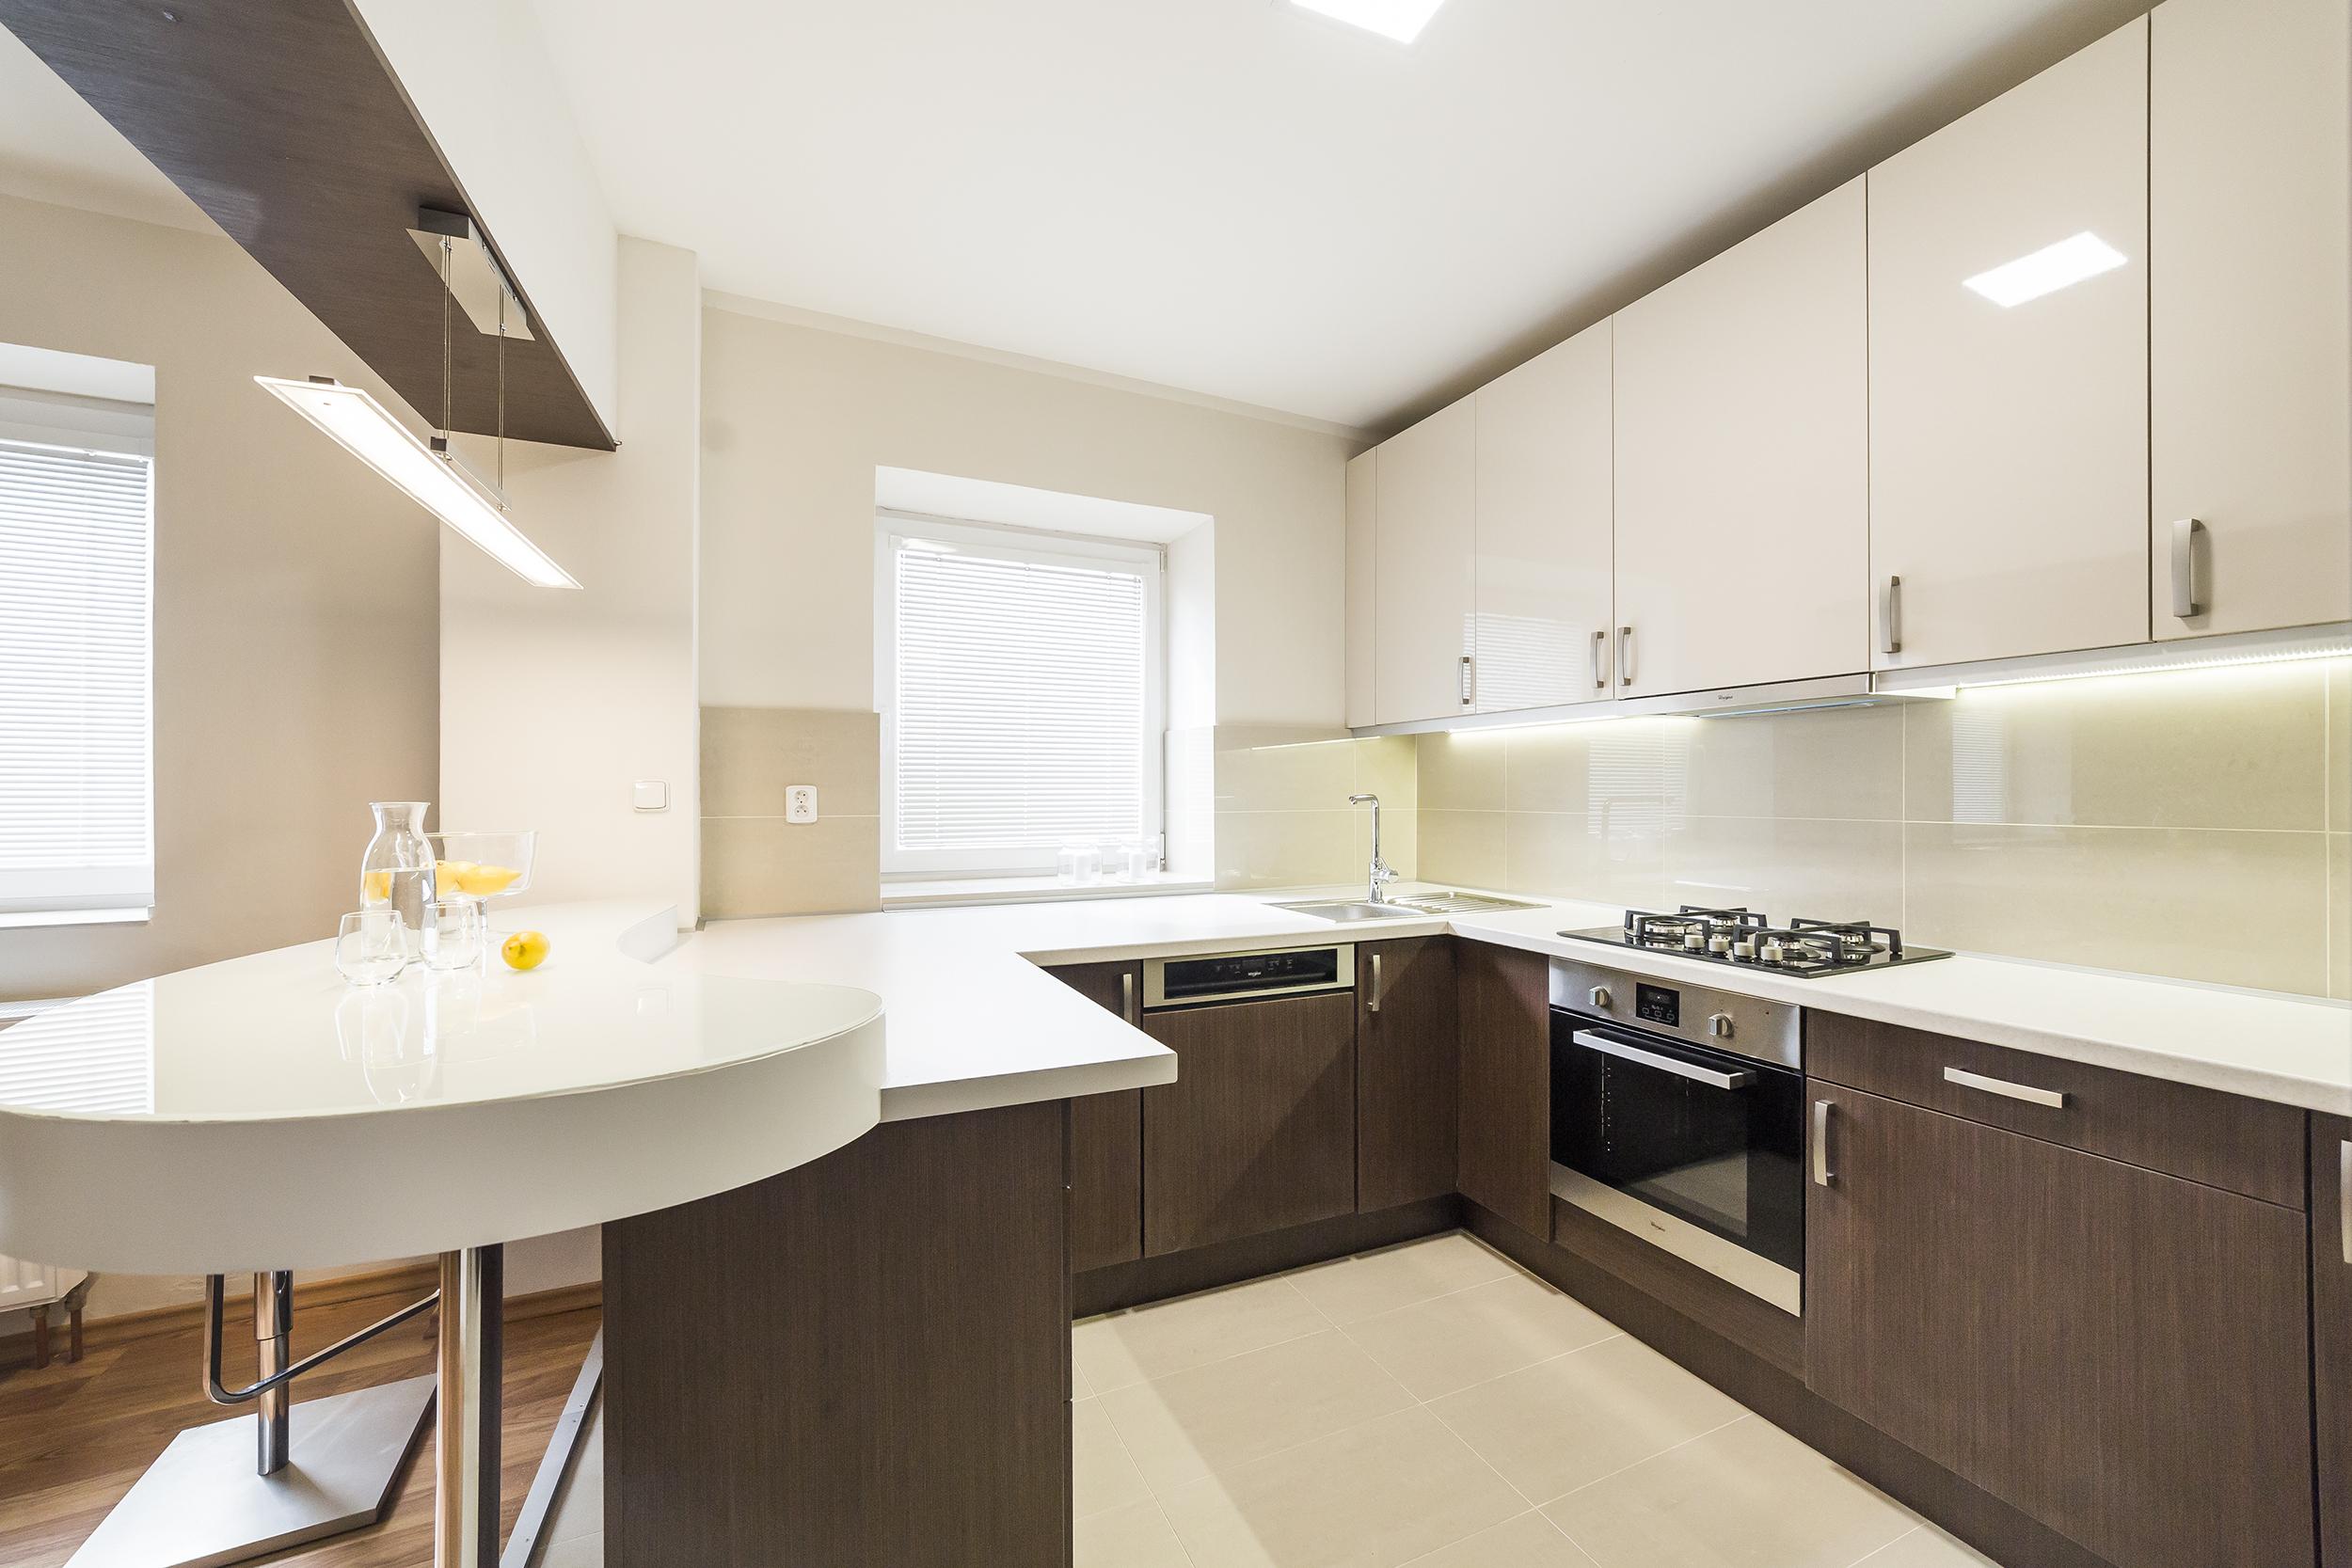 kuchyn podlaha sporak trouba okno svetlo voda citron prodej bytu opava linda bittova